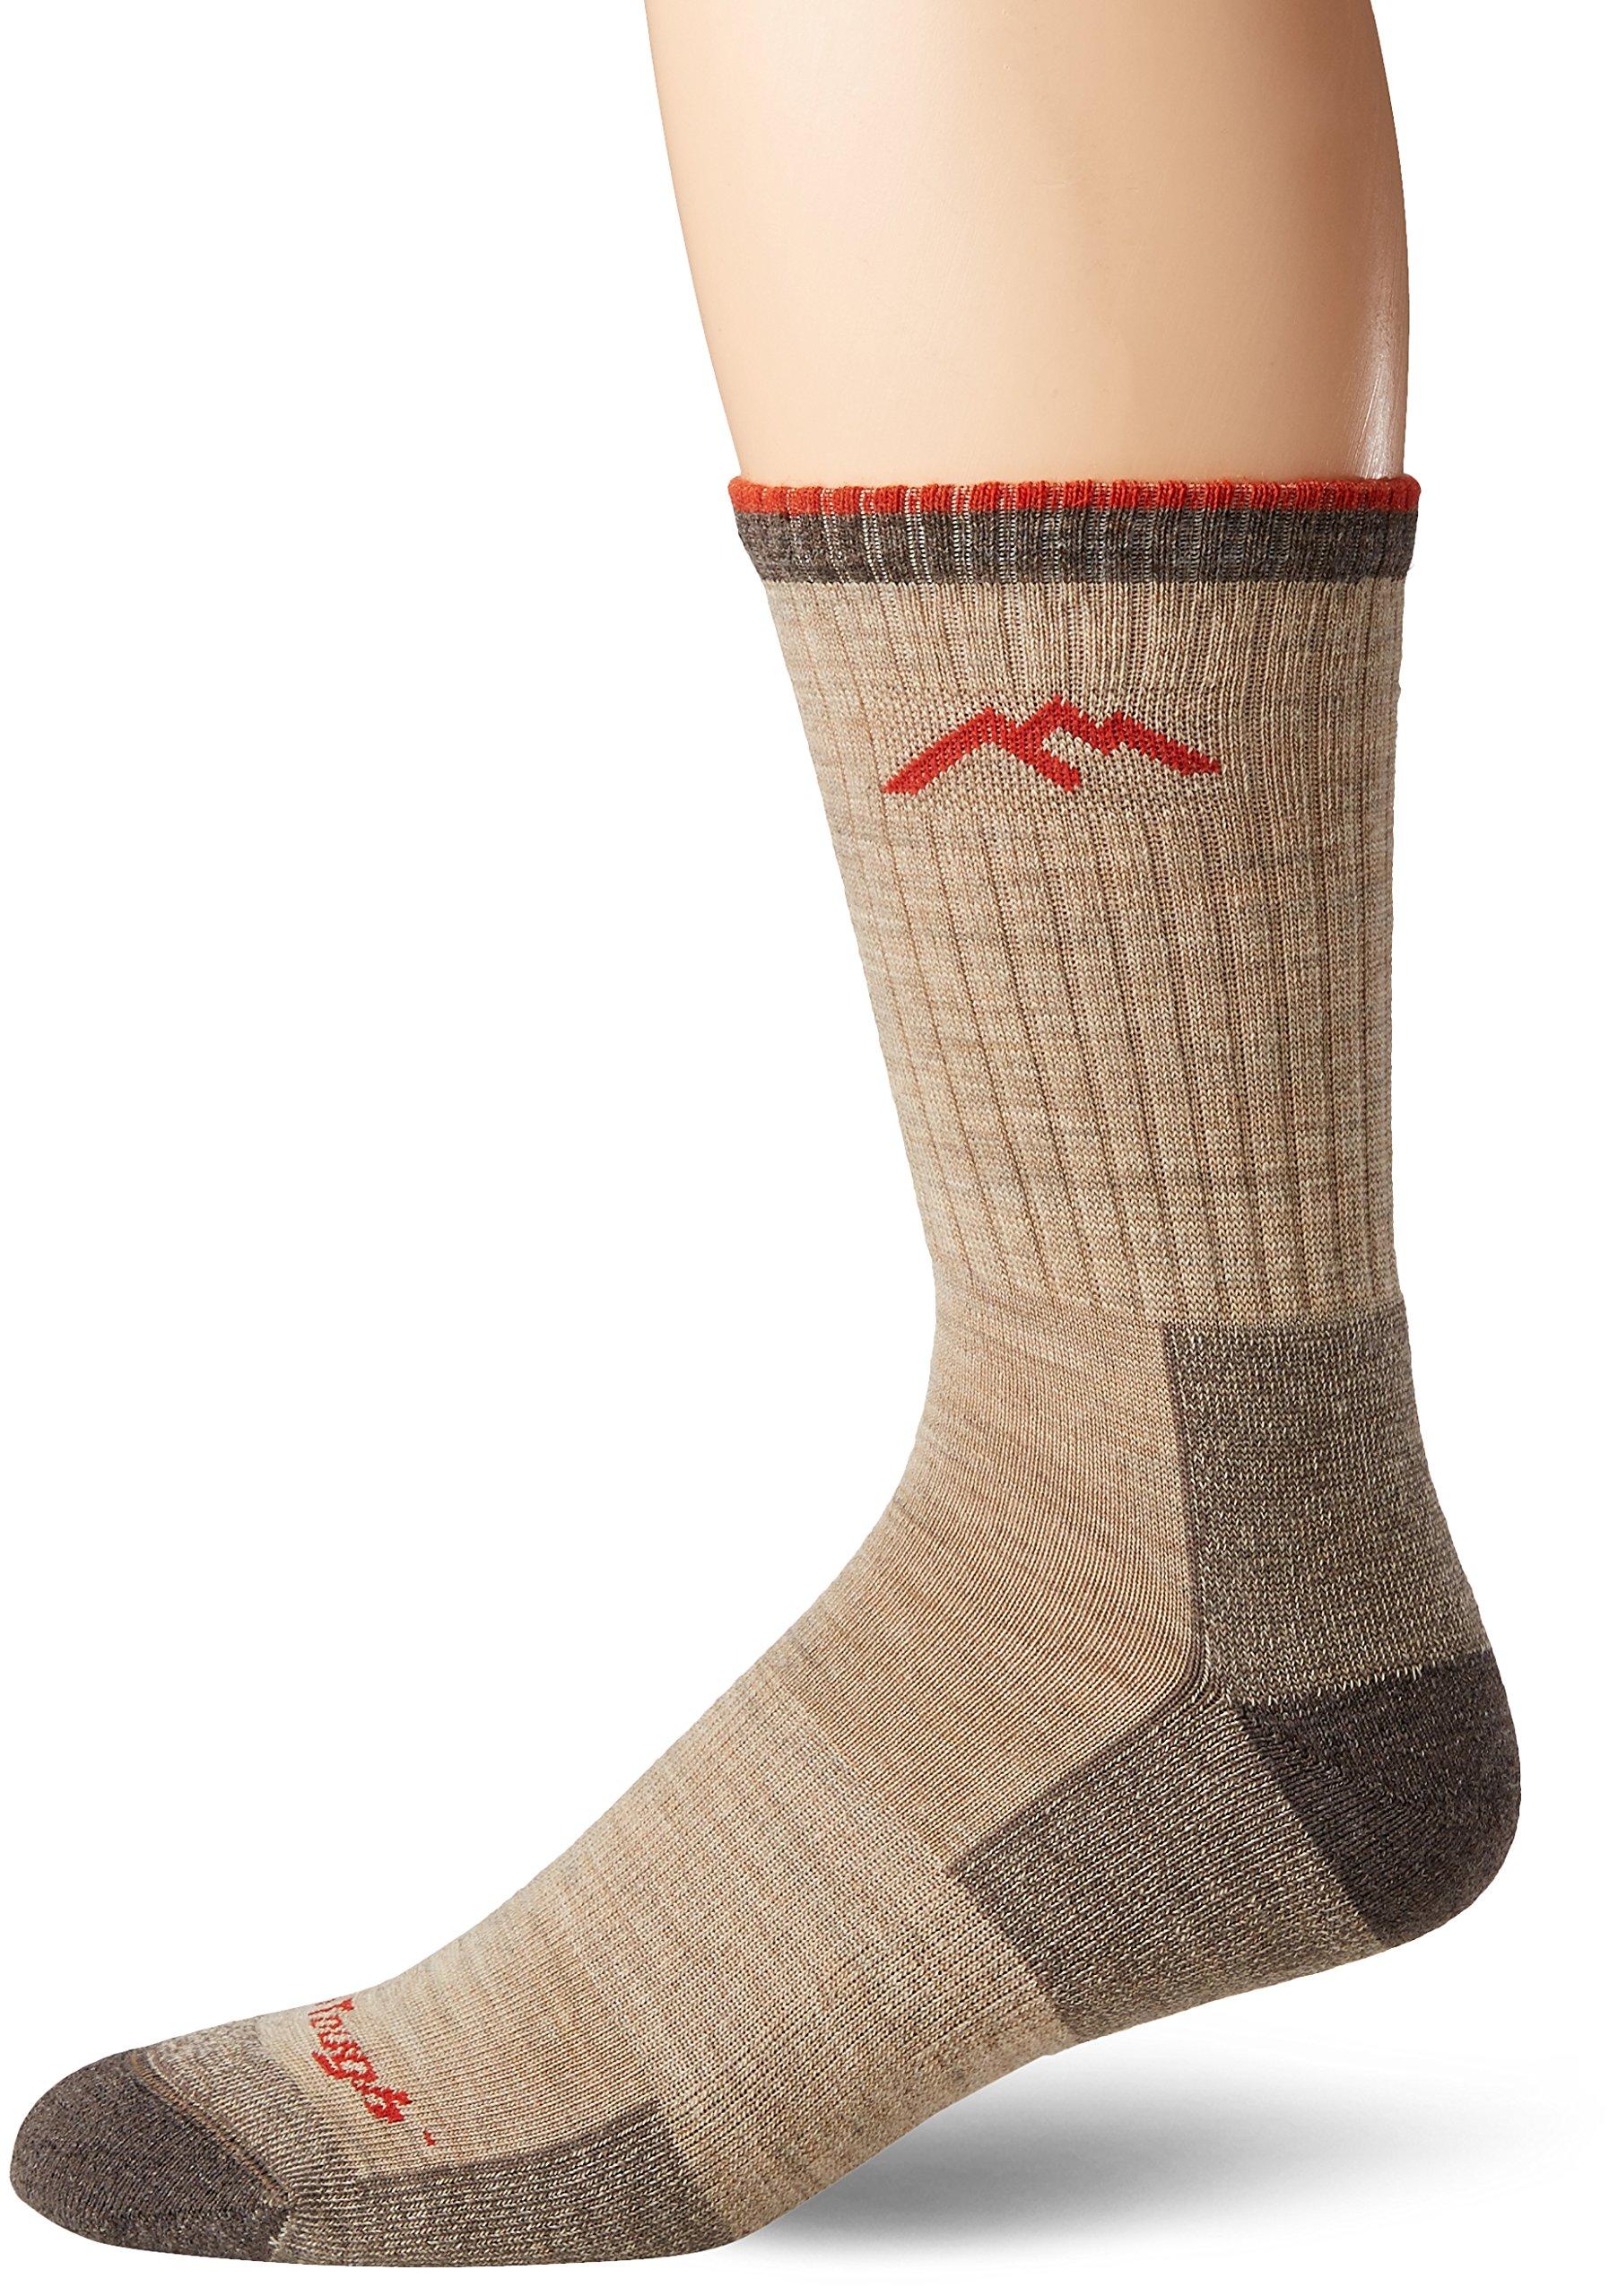 Darn Tough Hiker Micro Crew Cushion Socks – Men's